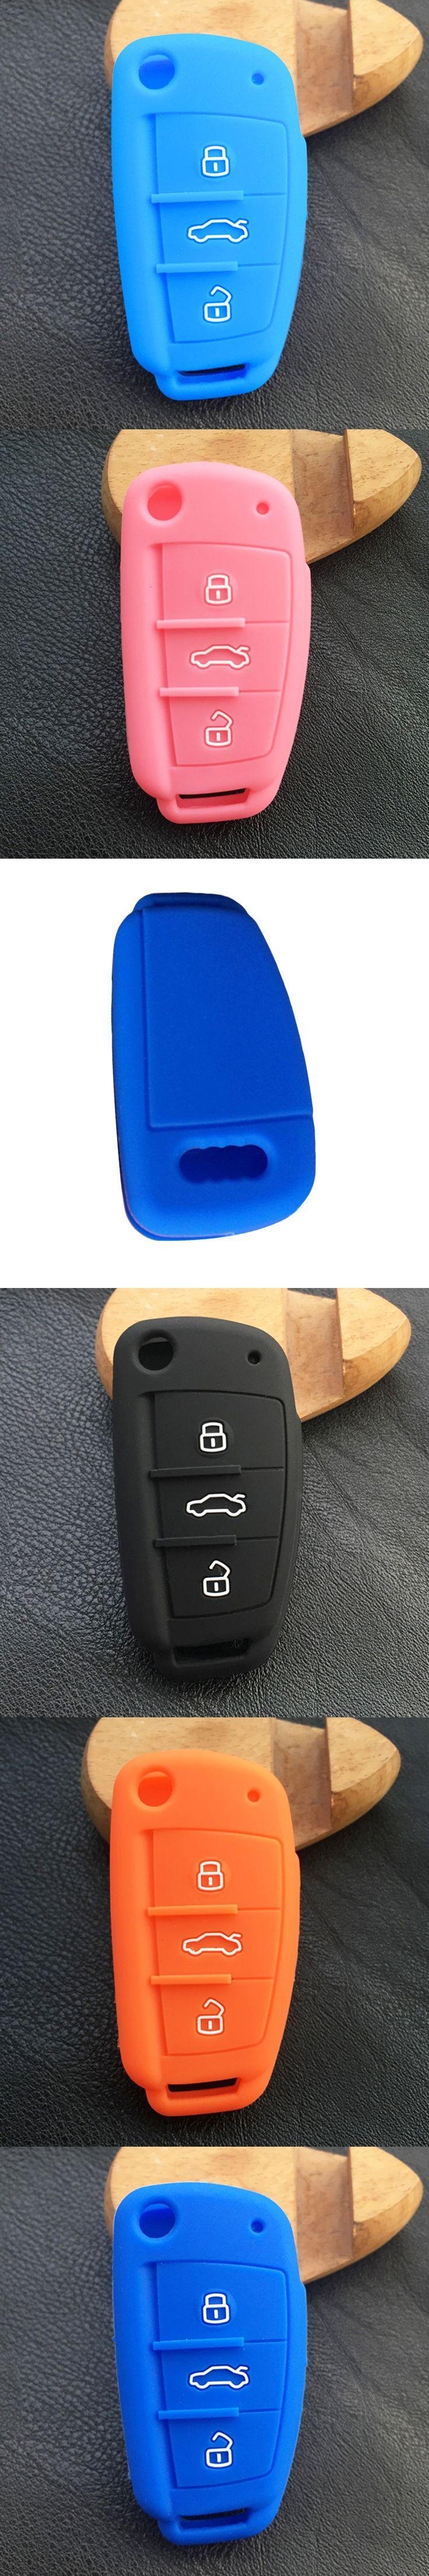 Dewtreetali hot silicone car key fob cover case skin for Audi A1 A2 A3 A4 A5 A6 A7 TT  Q5 Q7 R8 S6 S7 S8 RS5 flip folding remote